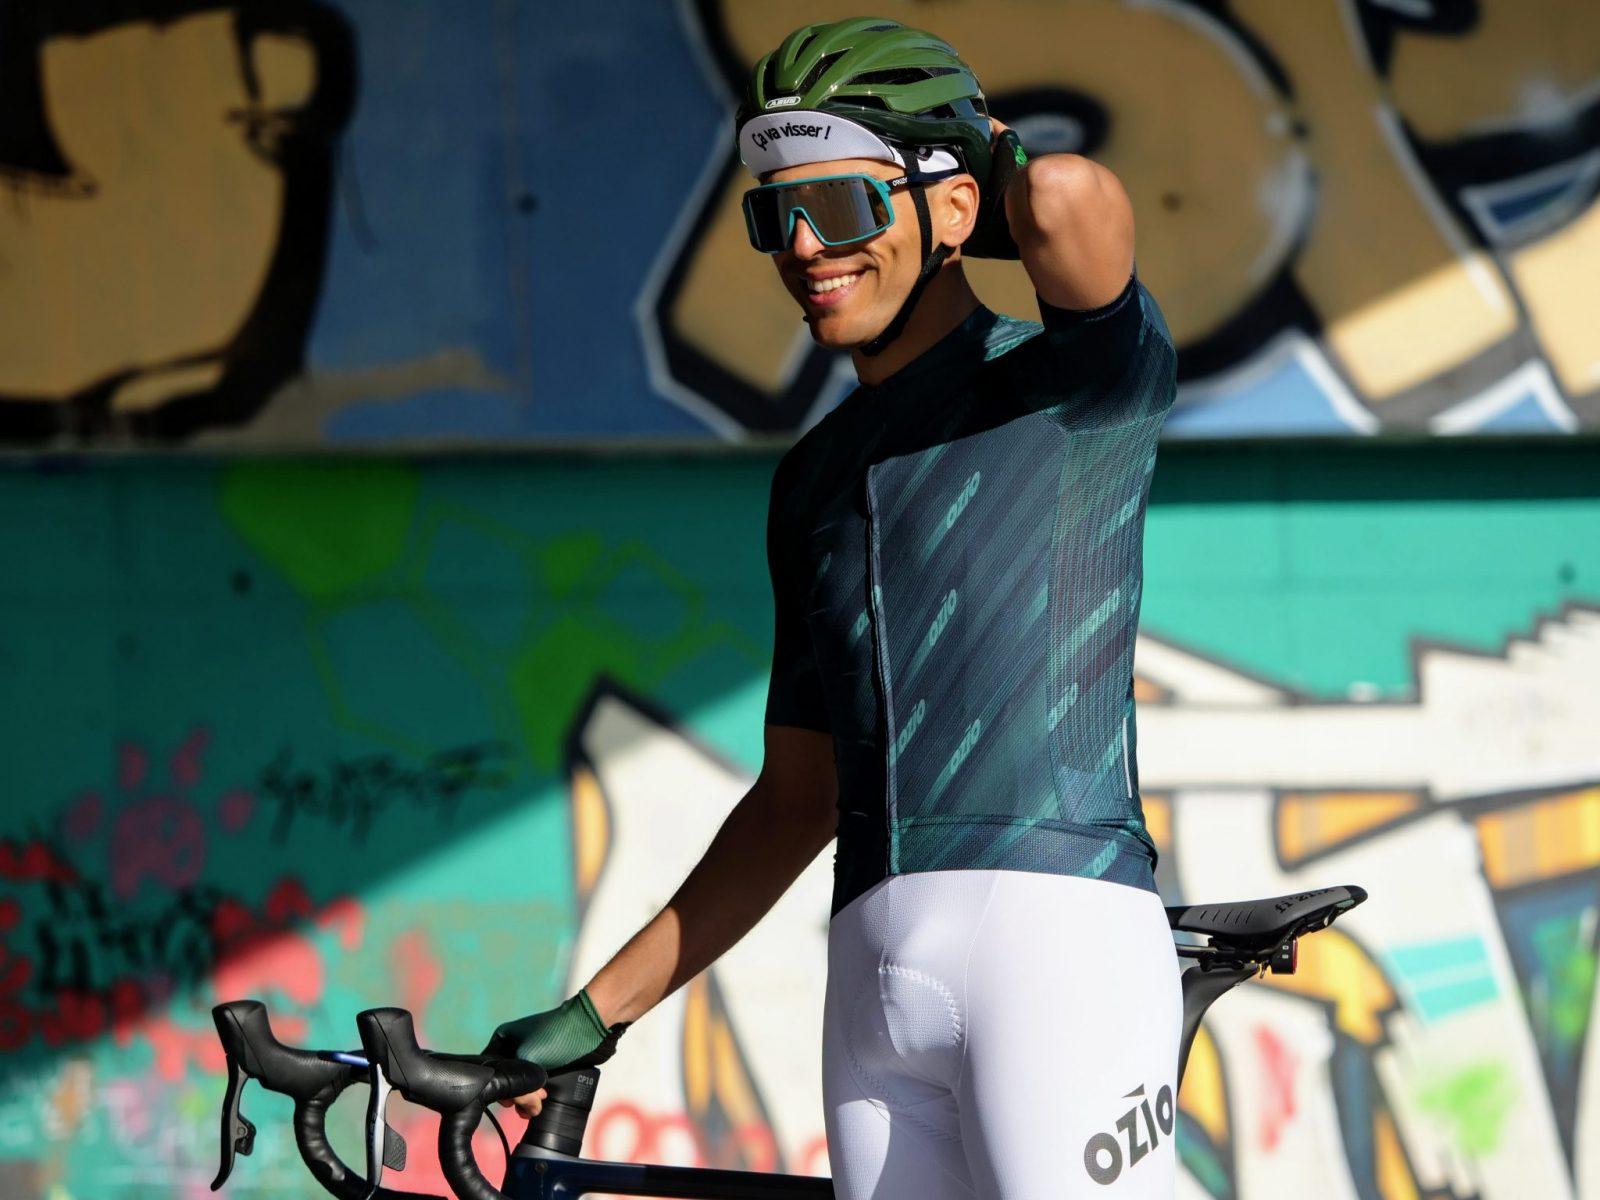 Cycliste cuissard vélo blanc ozio maillot vert